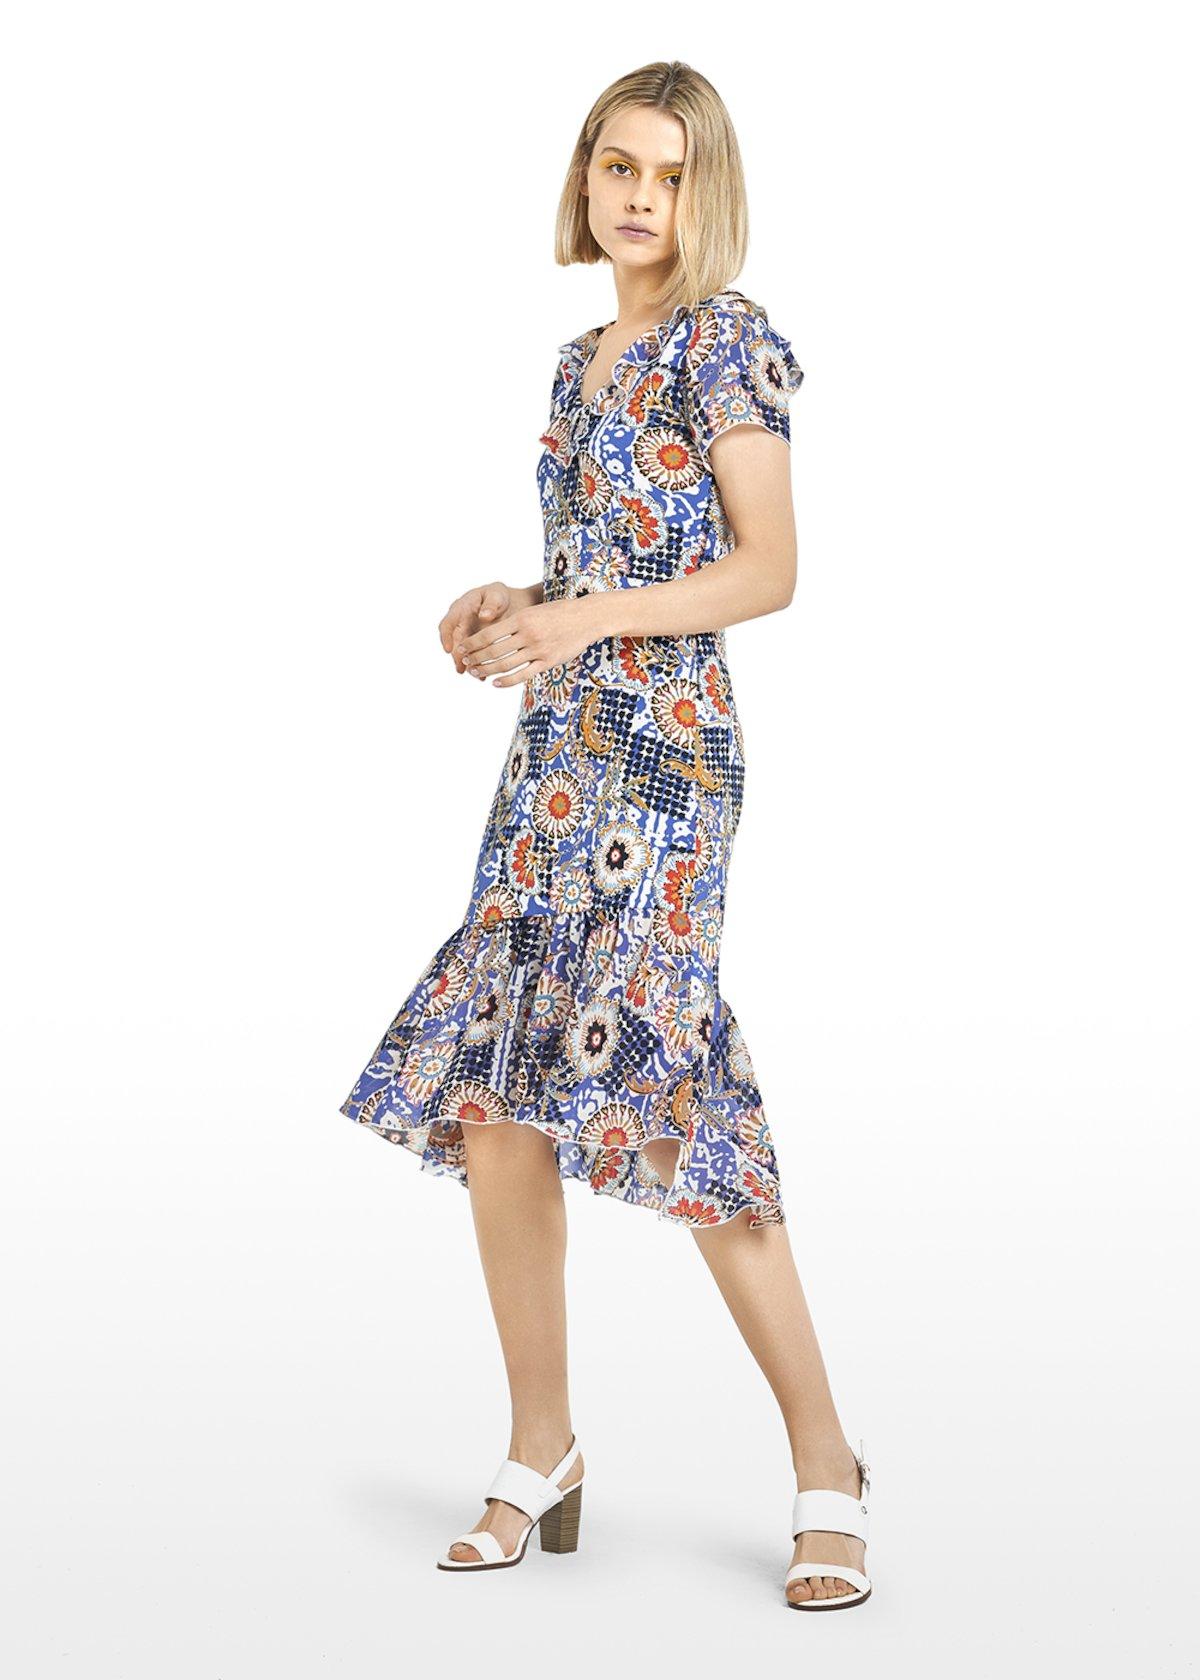 Alvin short-sleeved majolica print dress - Avion / White Fantasia - Woman - Category image